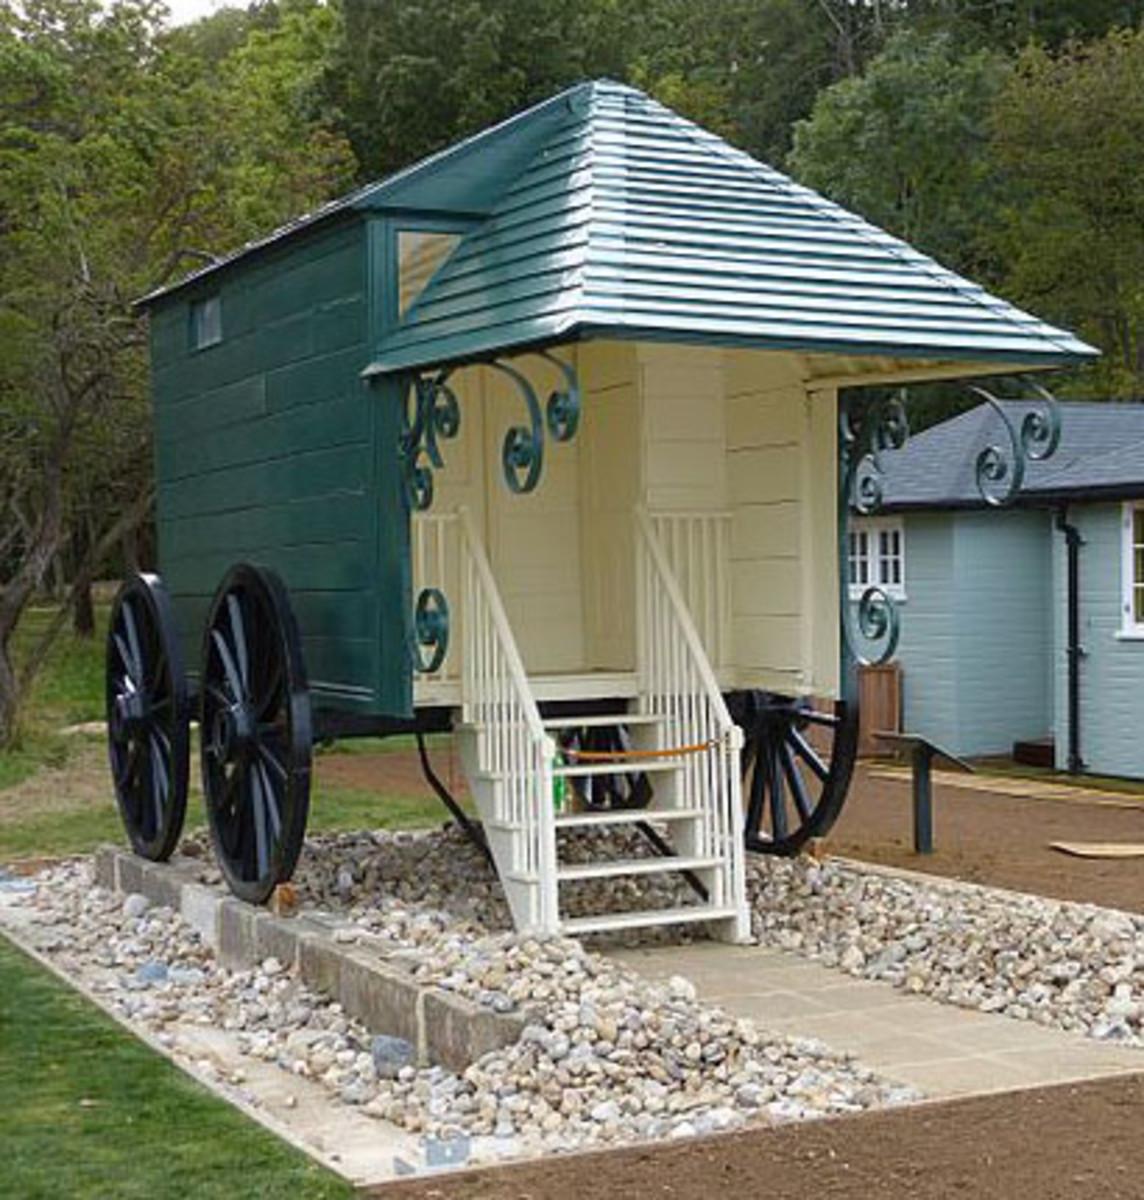 Queen Victoria's fancy bathing machine, which has been restored.